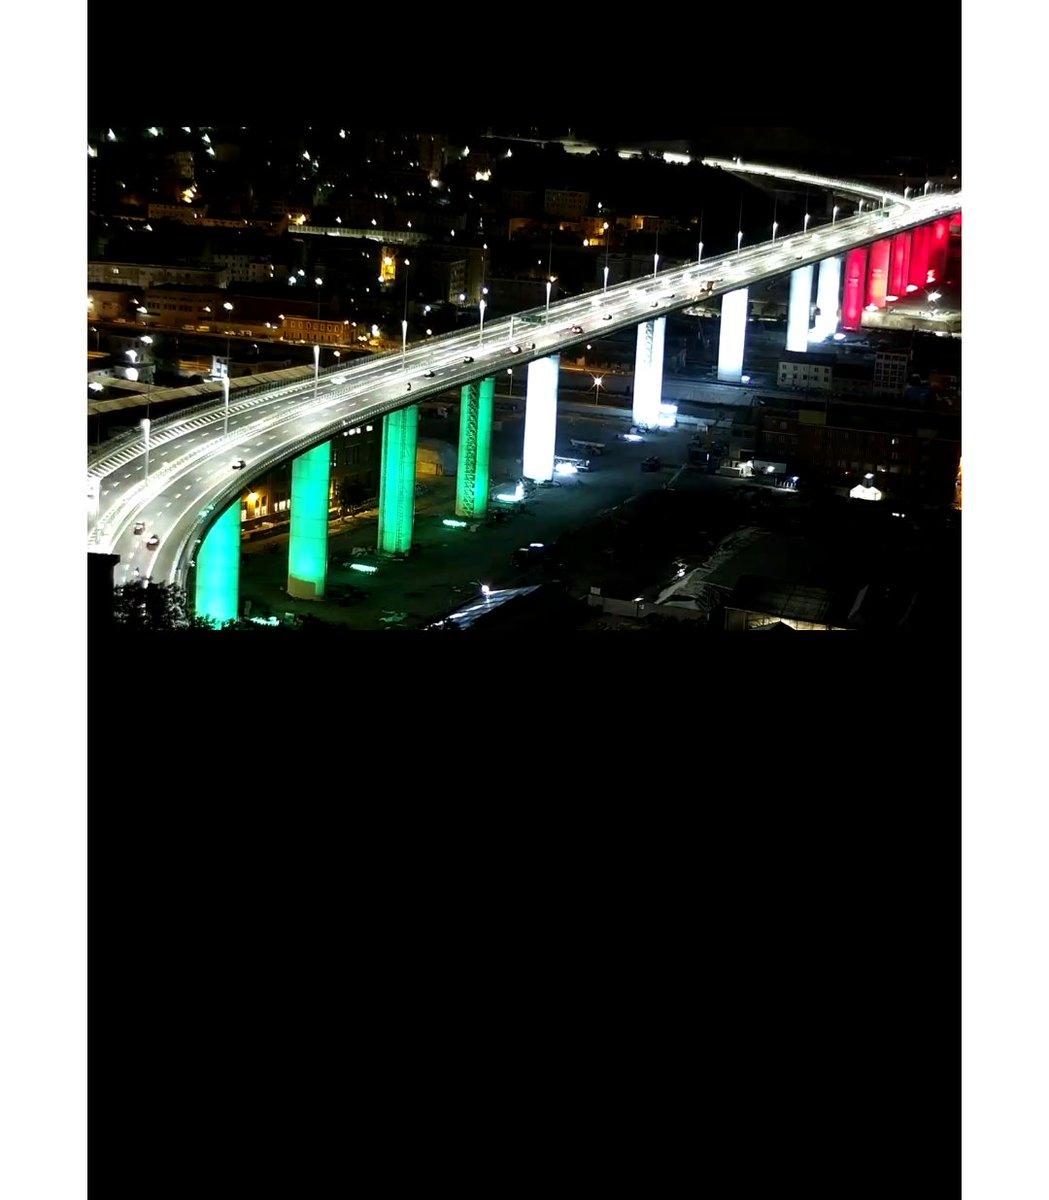 #pontegenovasangiorgio